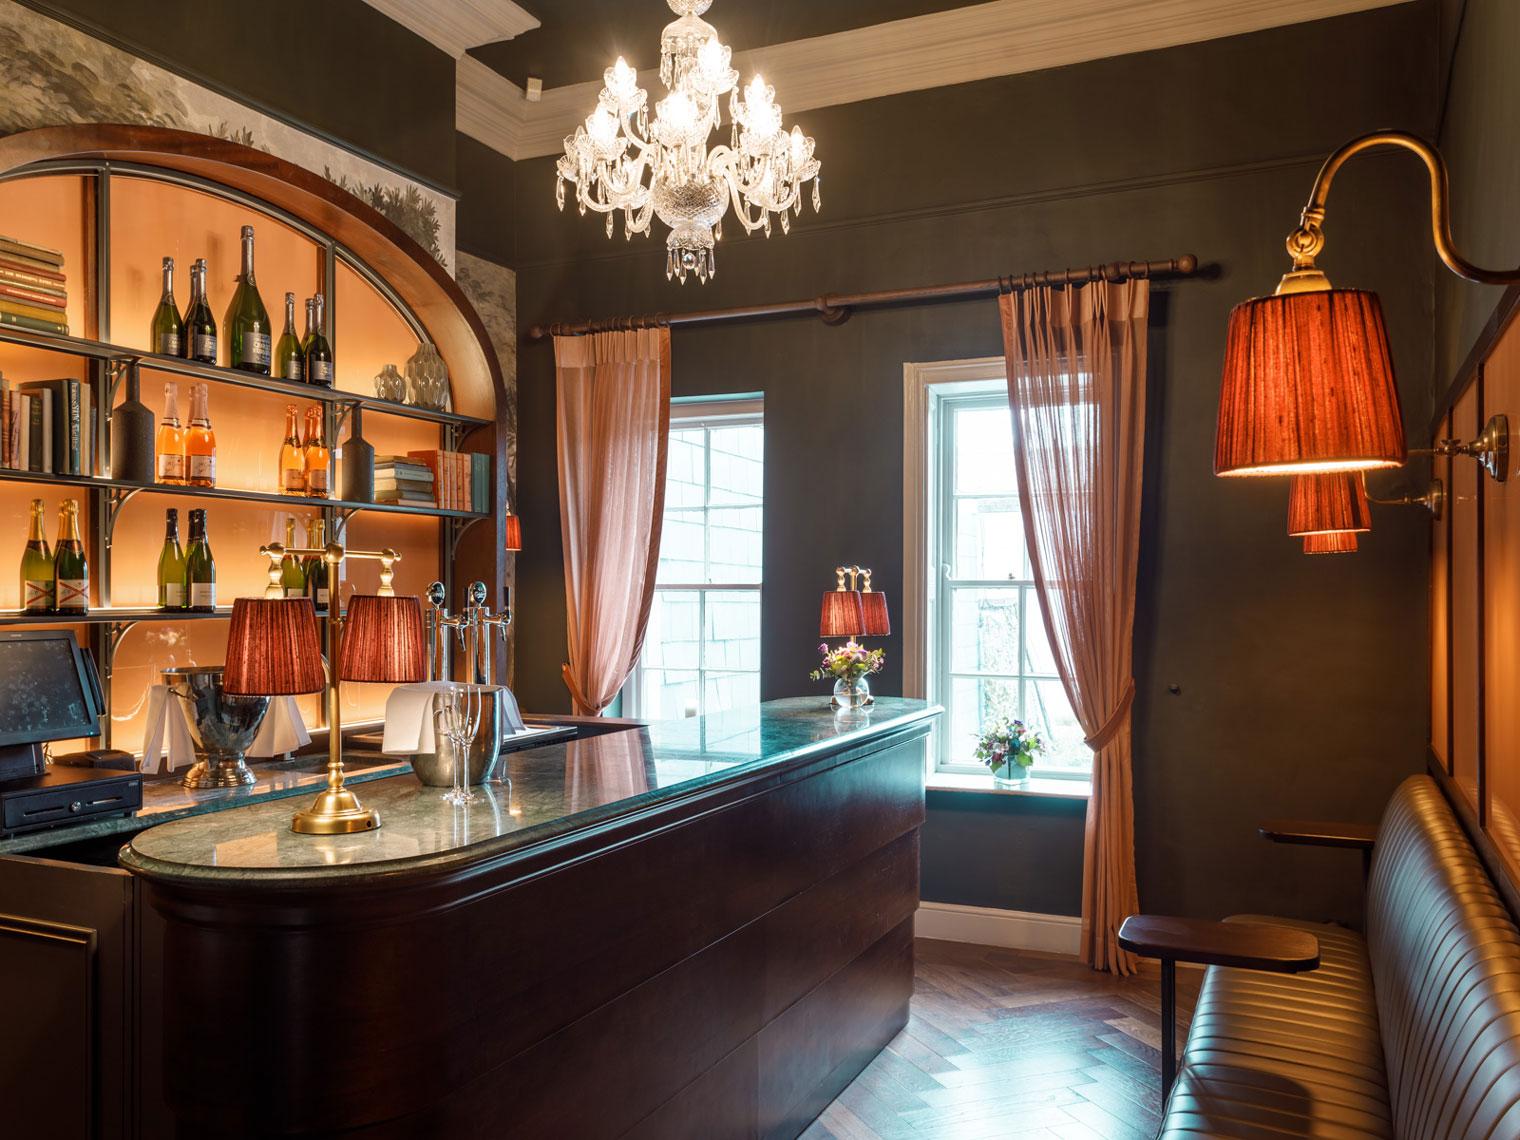 private dining venue Dublin, private dining dublin, private dining venue, 25 fitzwilliam place,